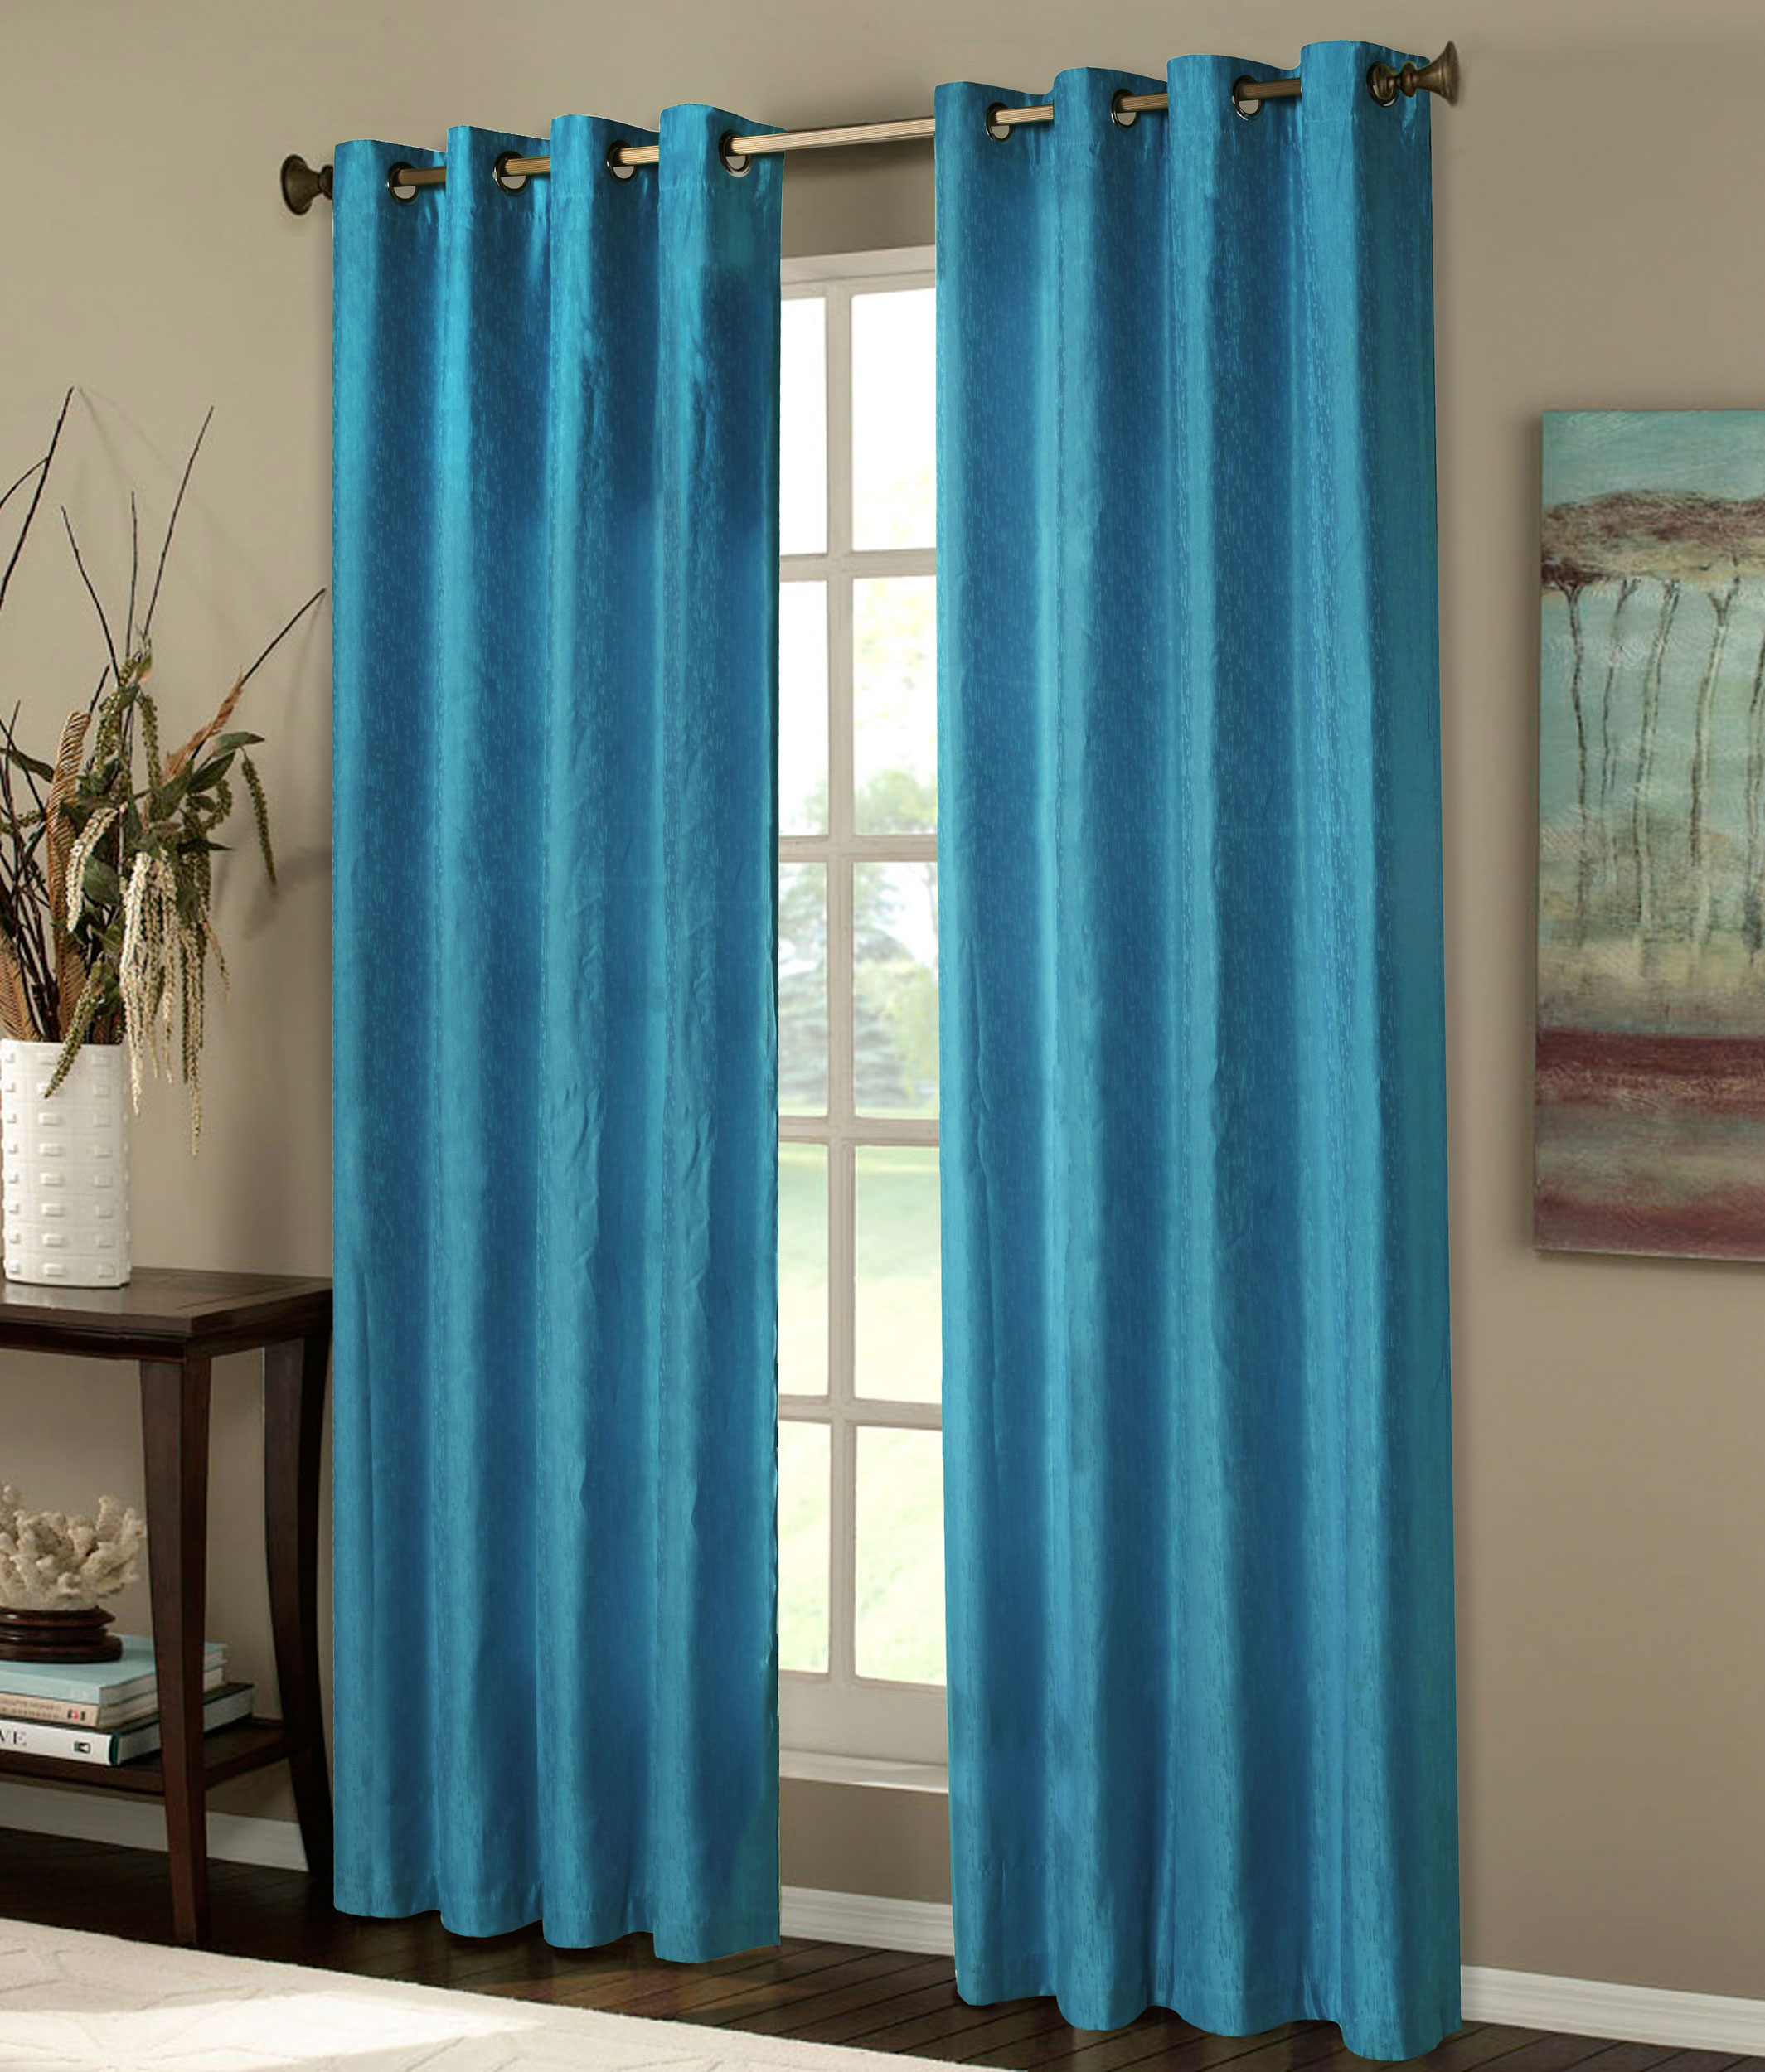 thermo gardine sen vorhang mit polar fleece r cken matt blickdicht 20500. Black Bedroom Furniture Sets. Home Design Ideas